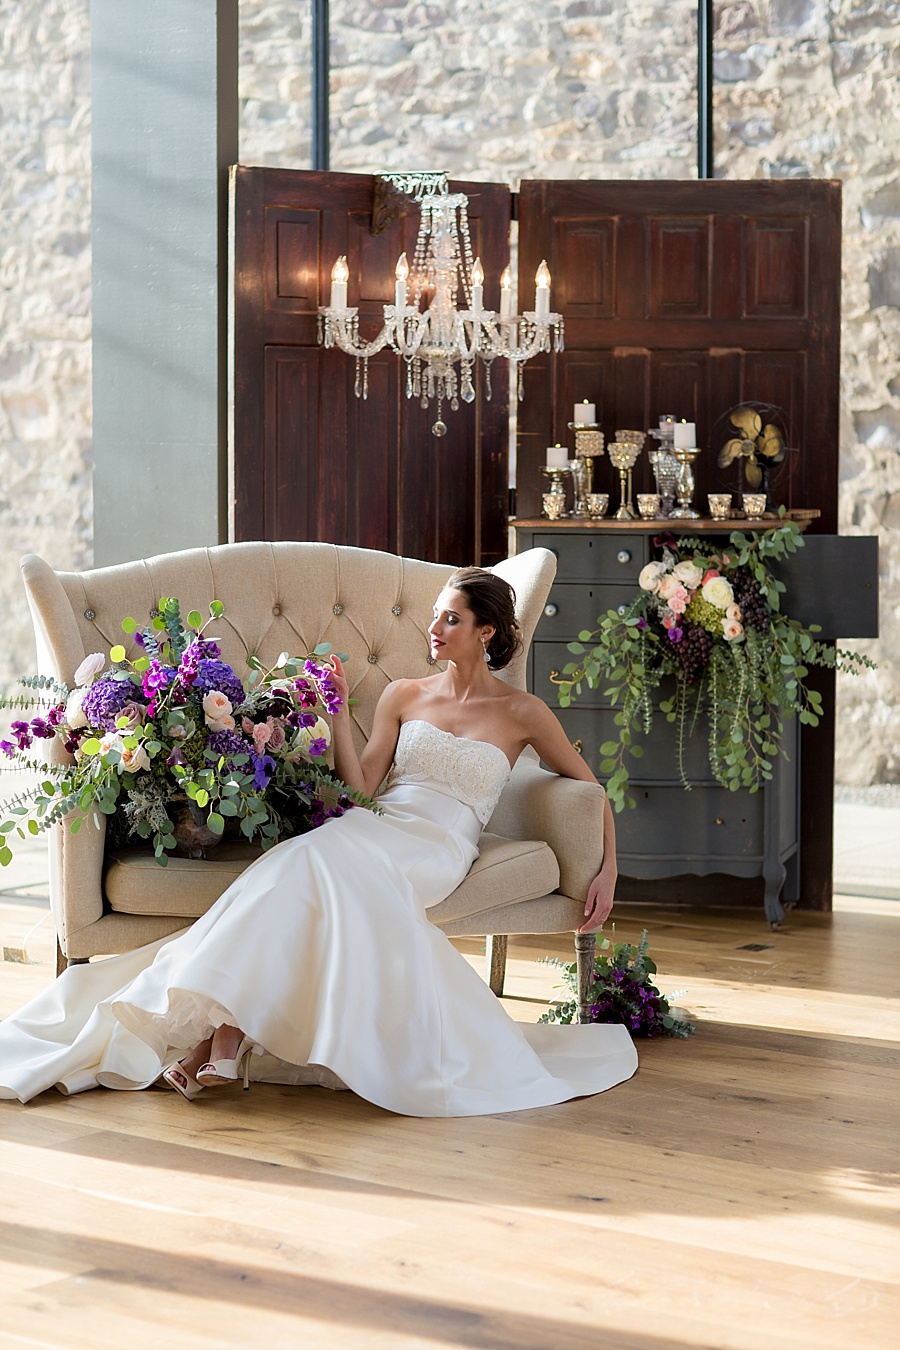 Vanessa_Joy_Photography_Details_of_I_do_Jean_Ralph_Thurin_Wedding_Gowns_April_Lynn_Designs_Wedding_Stationery23